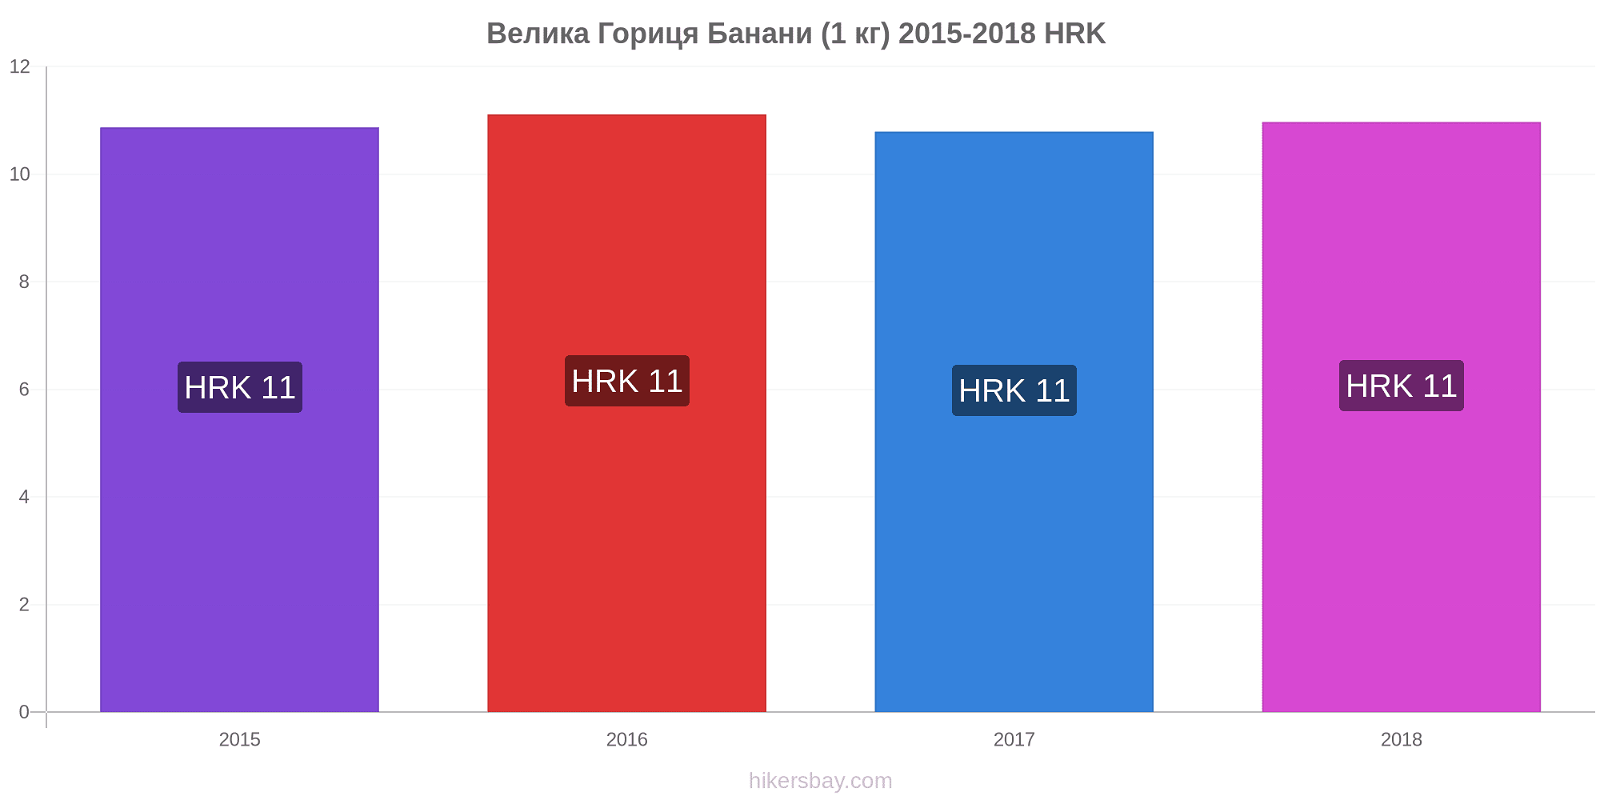 Велика Гориця зміни цін Банани (1 кг) hikersbay.com